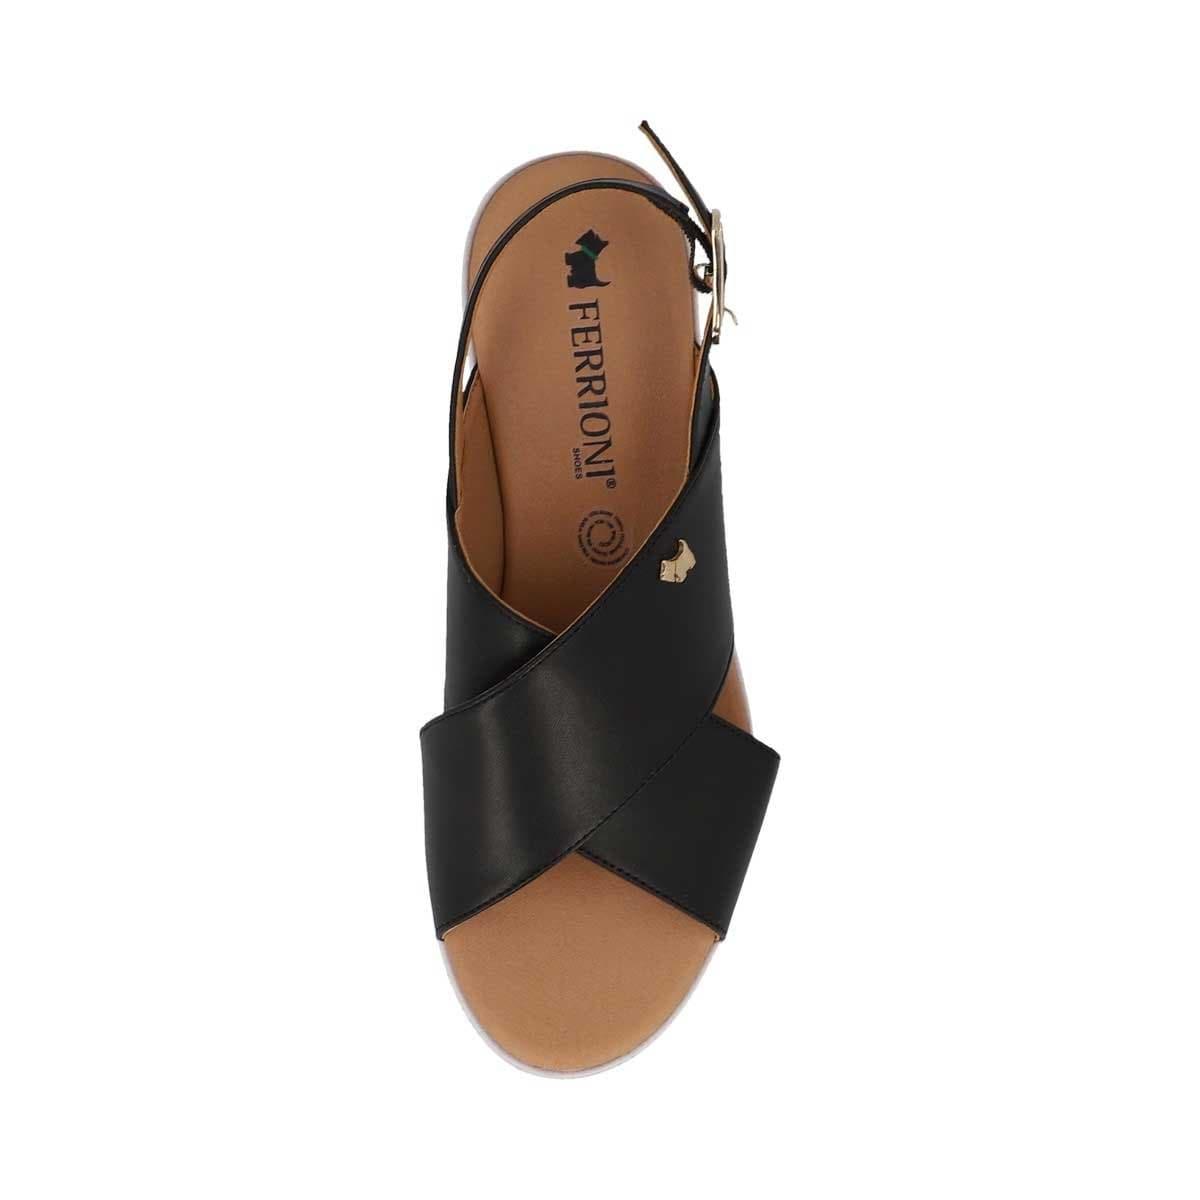 Sandalia Negra de Tiras Cruzadas Ferrioni